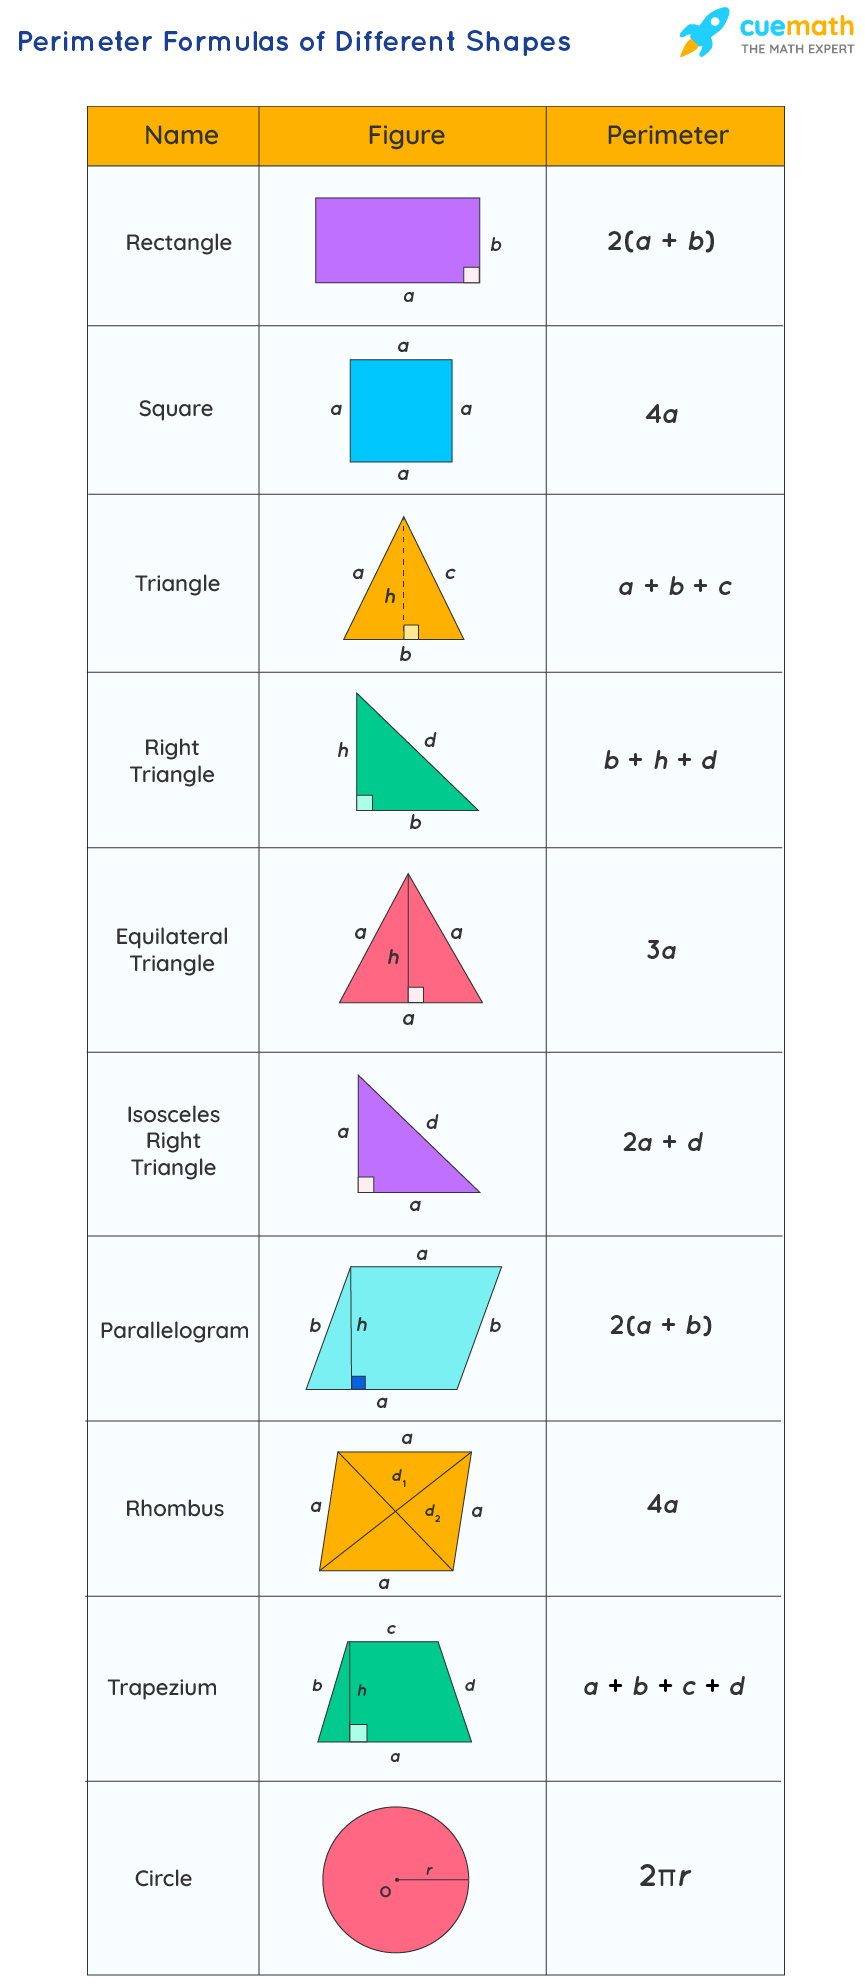 Perimeter Formulas of Different Shapes